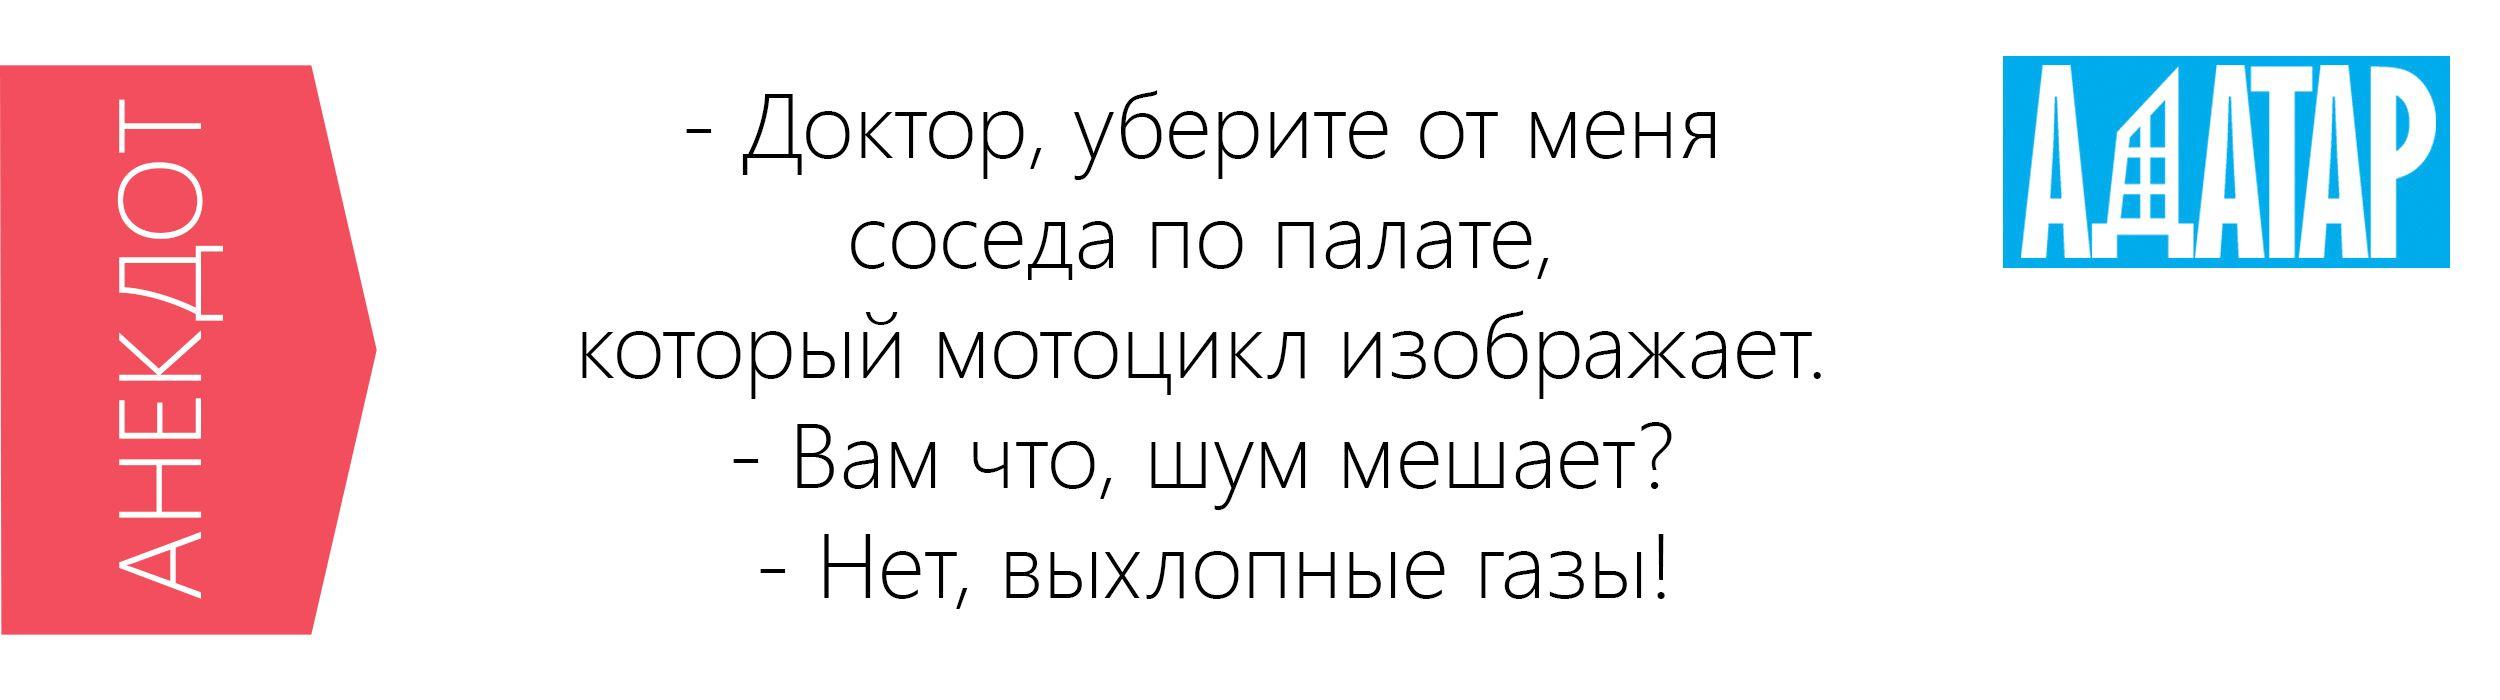 АНЕКДОТ 31.jpg